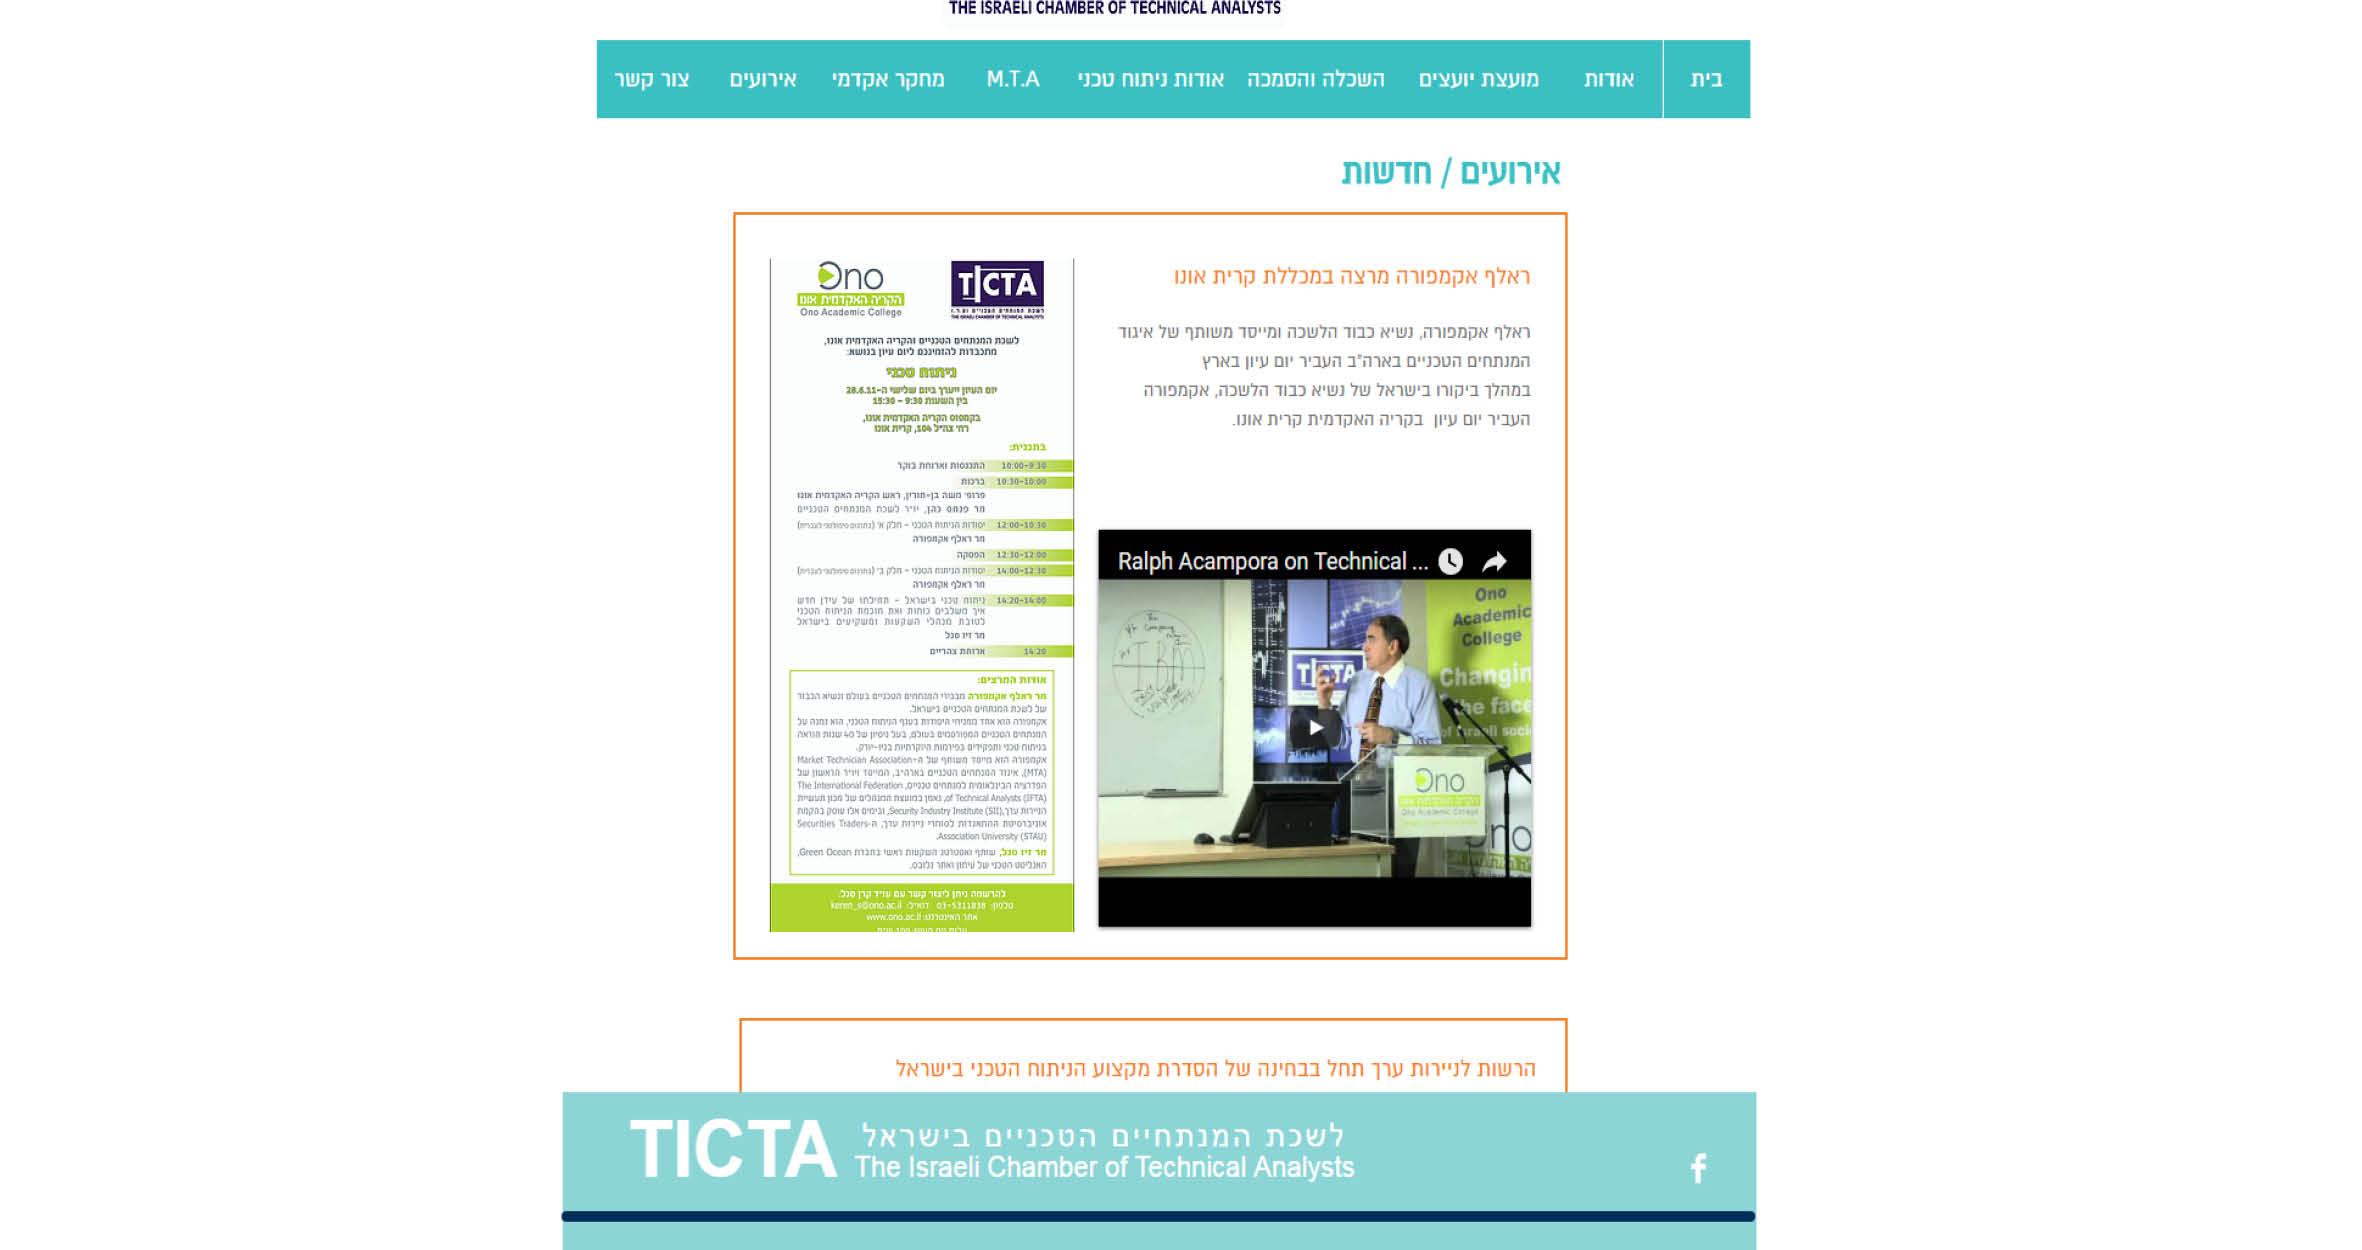 ticta5